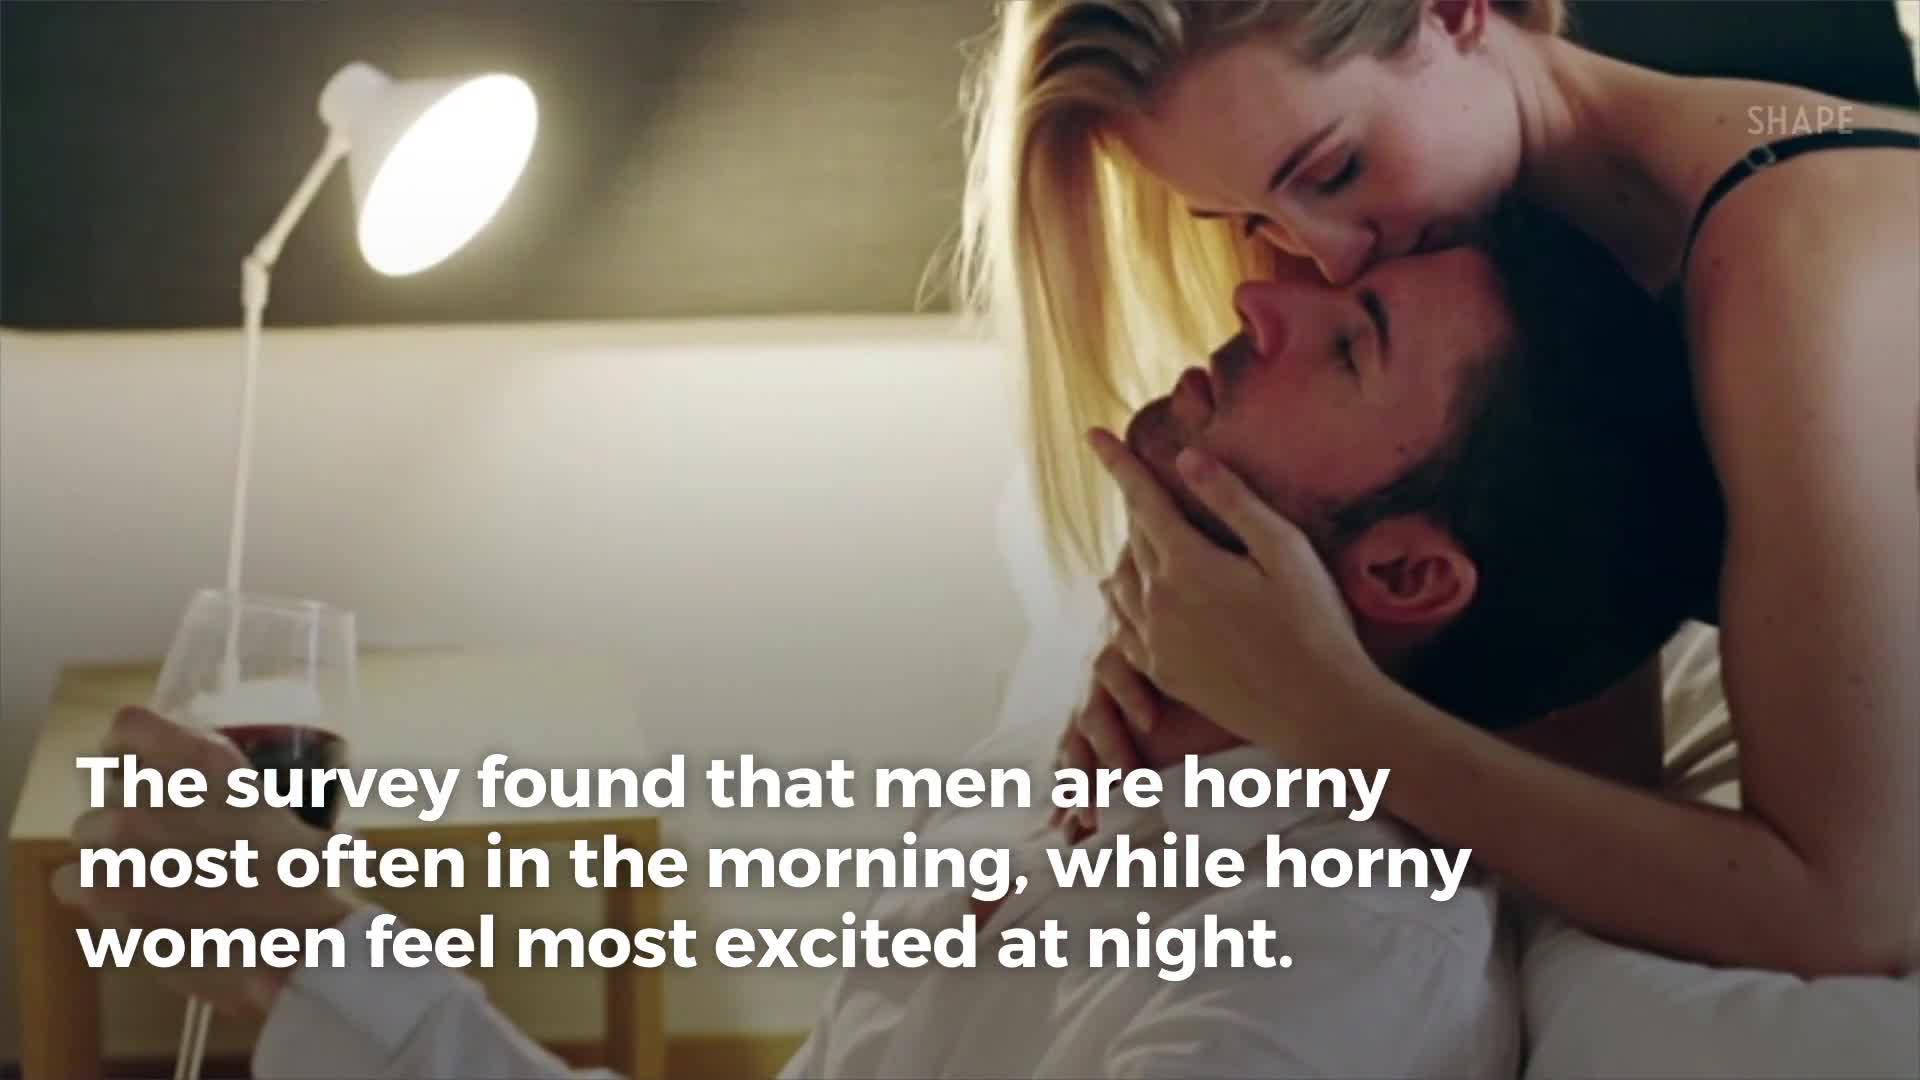 Why women feel horny